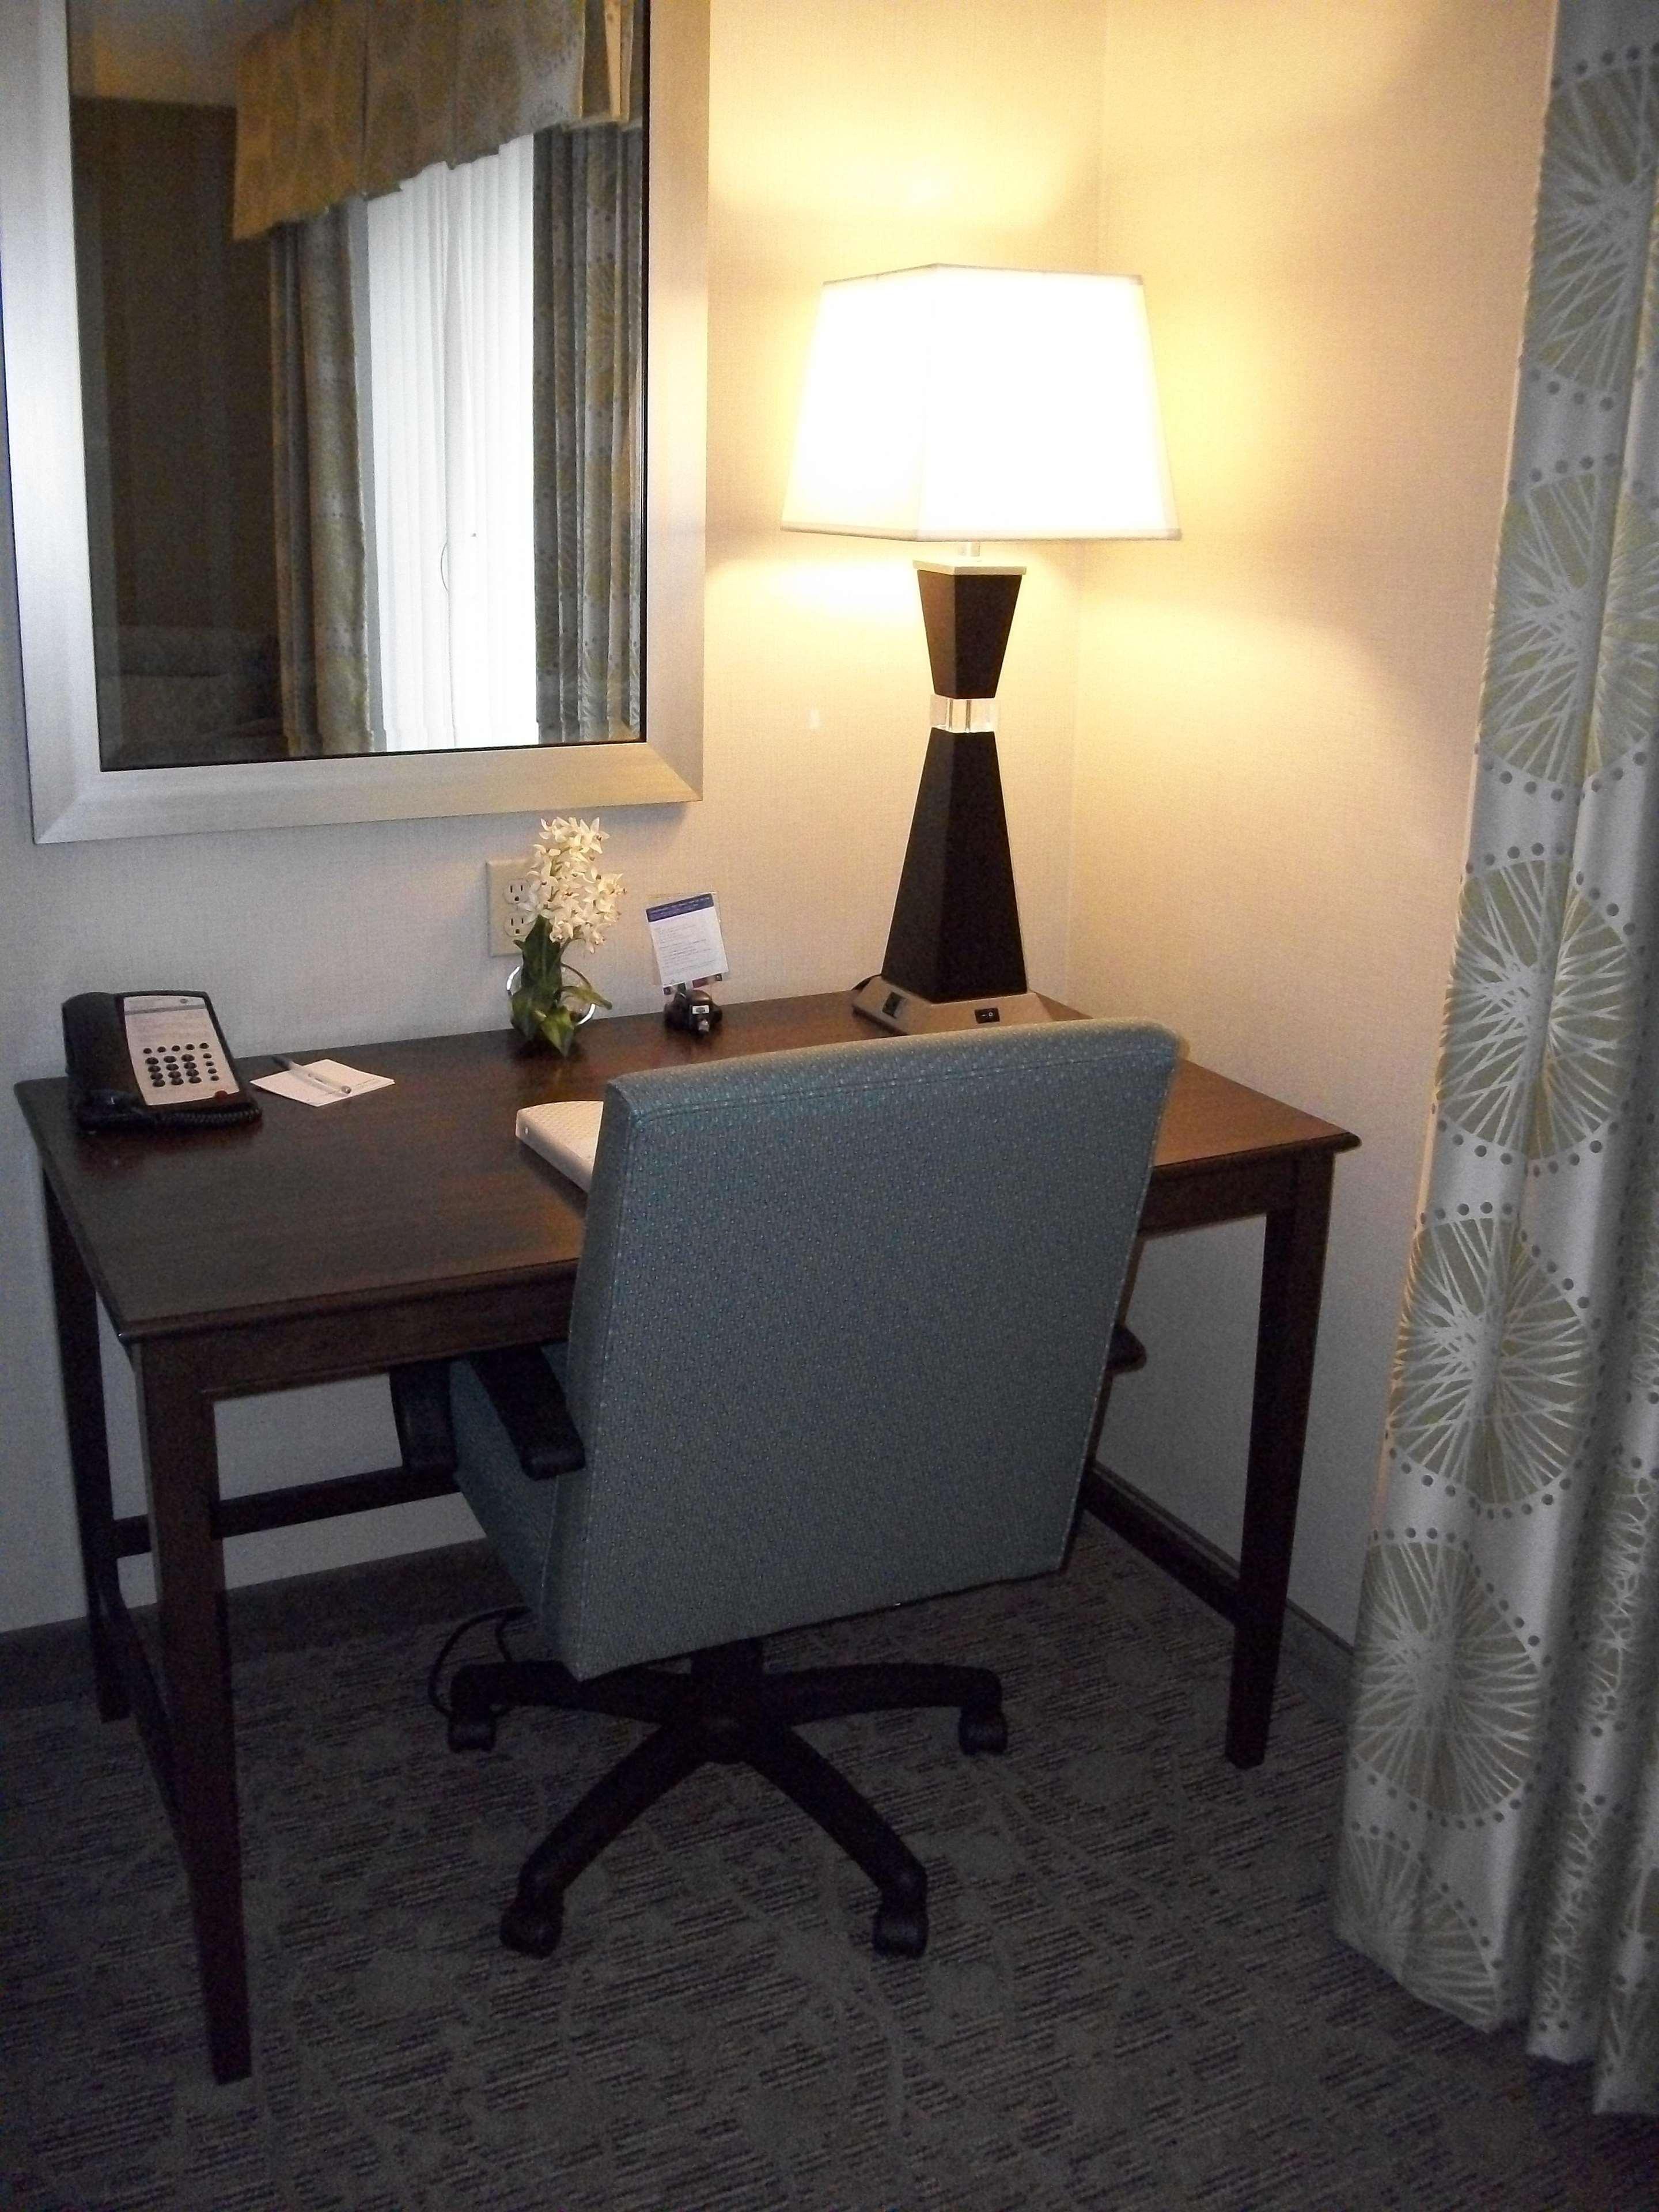 Hampton Inn & Suites Manteca image 44